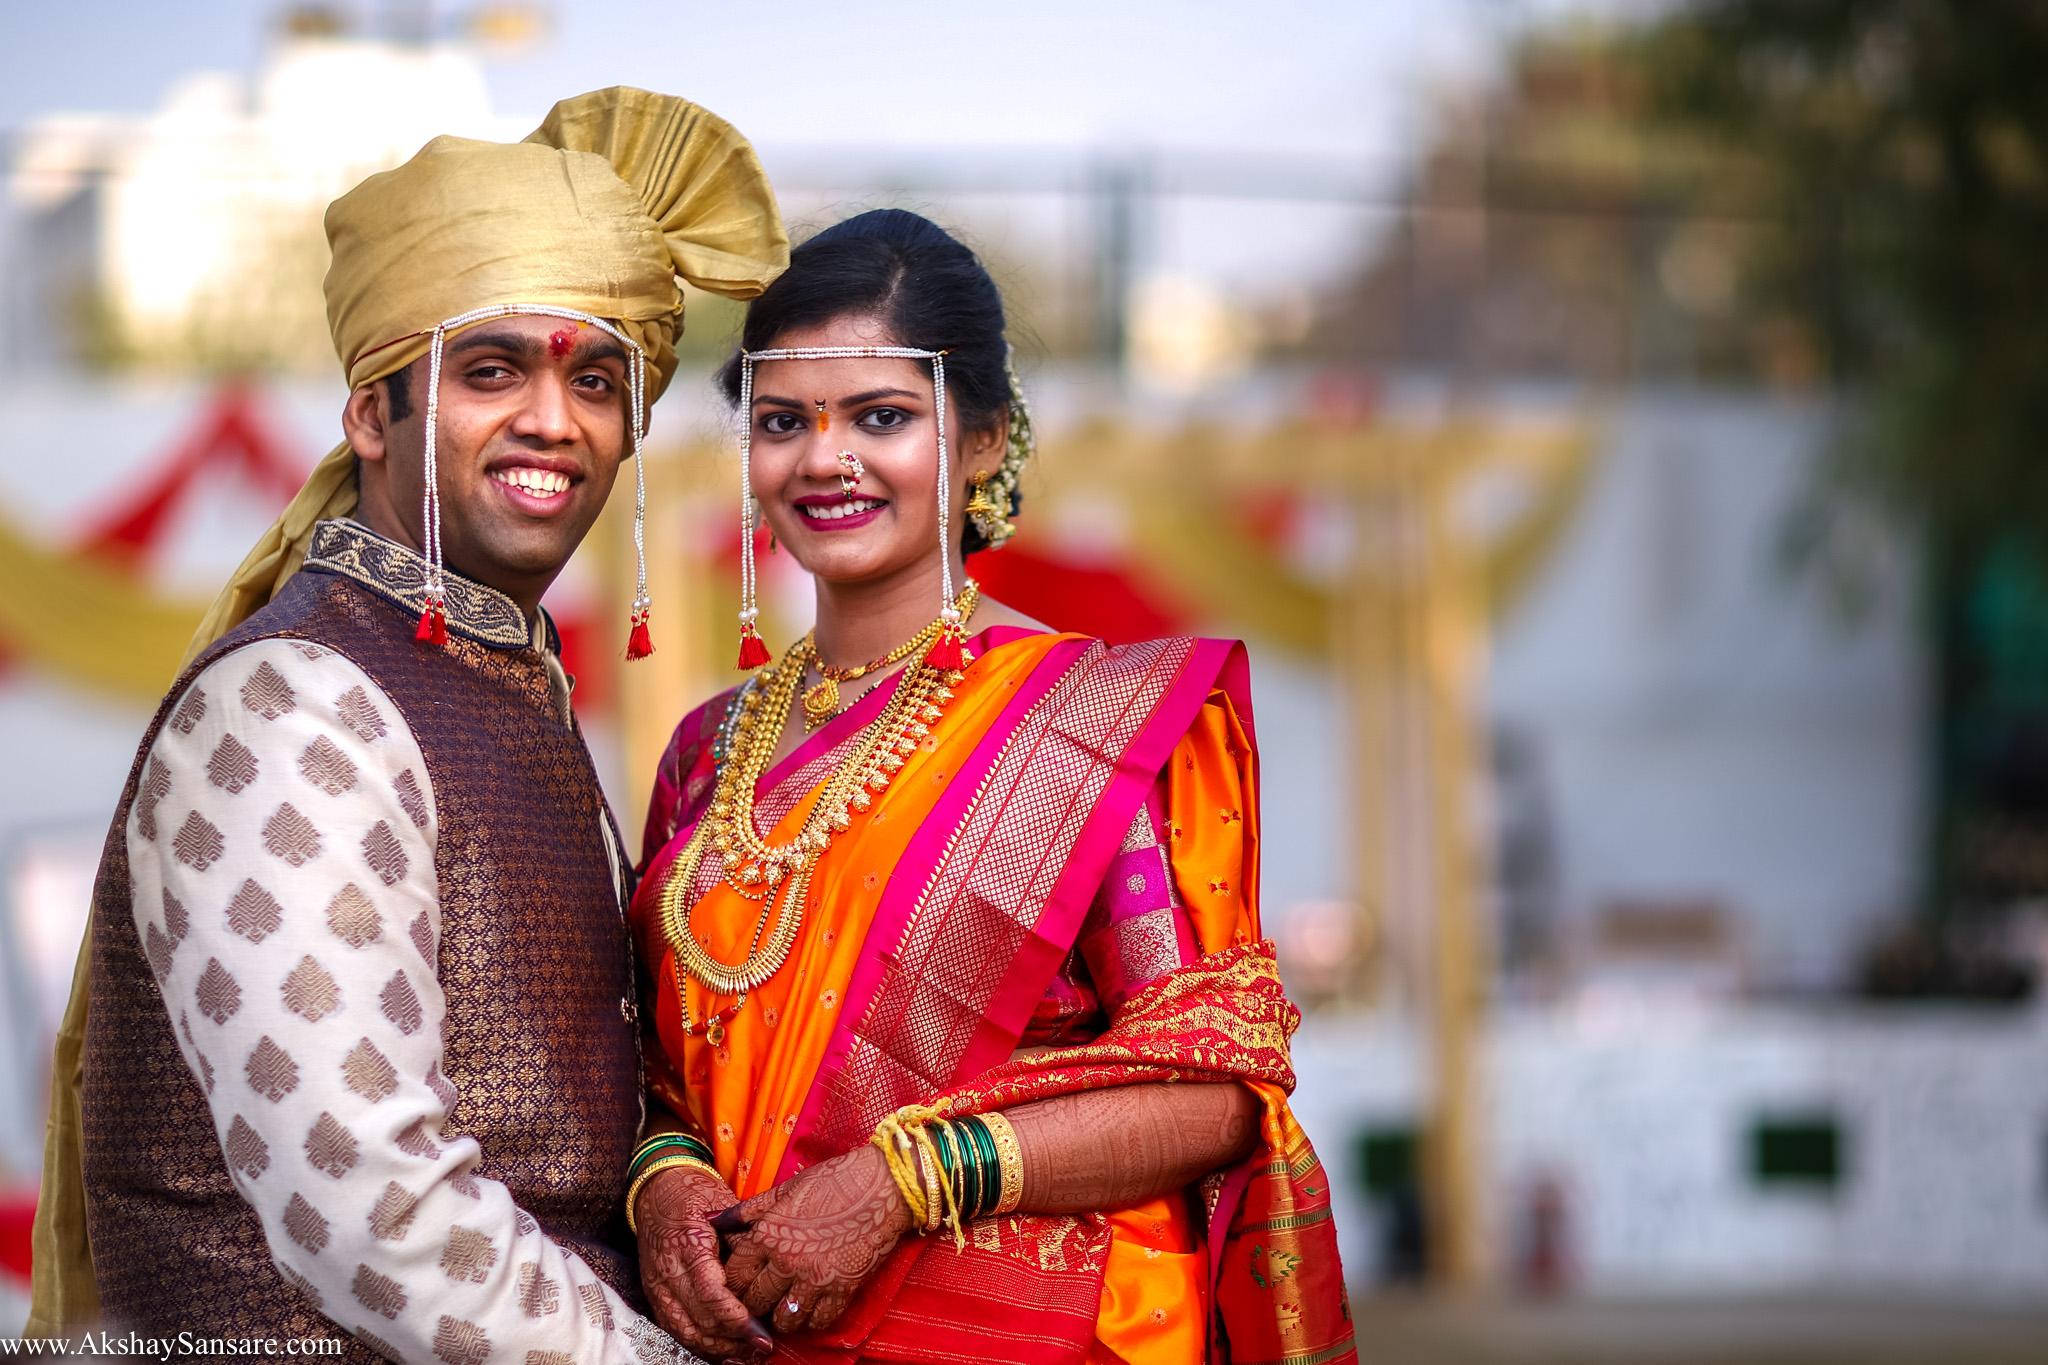 Salil x Kimaya Akshay Sansare Photography Candid wedding Photographer in mumbai best(38).jpg